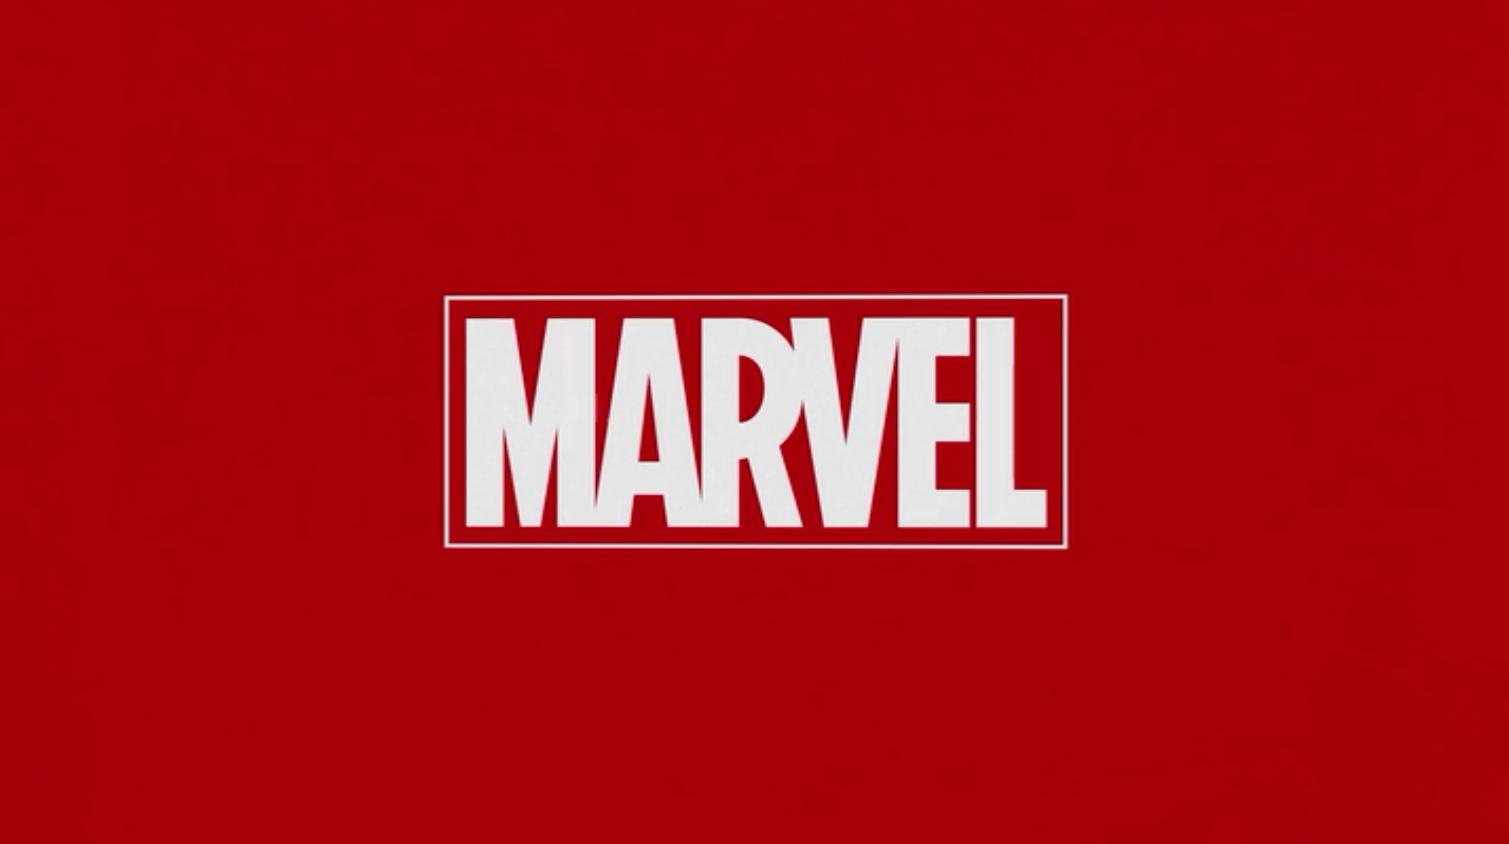 marvel logo daredevl 2015 snapikkcom